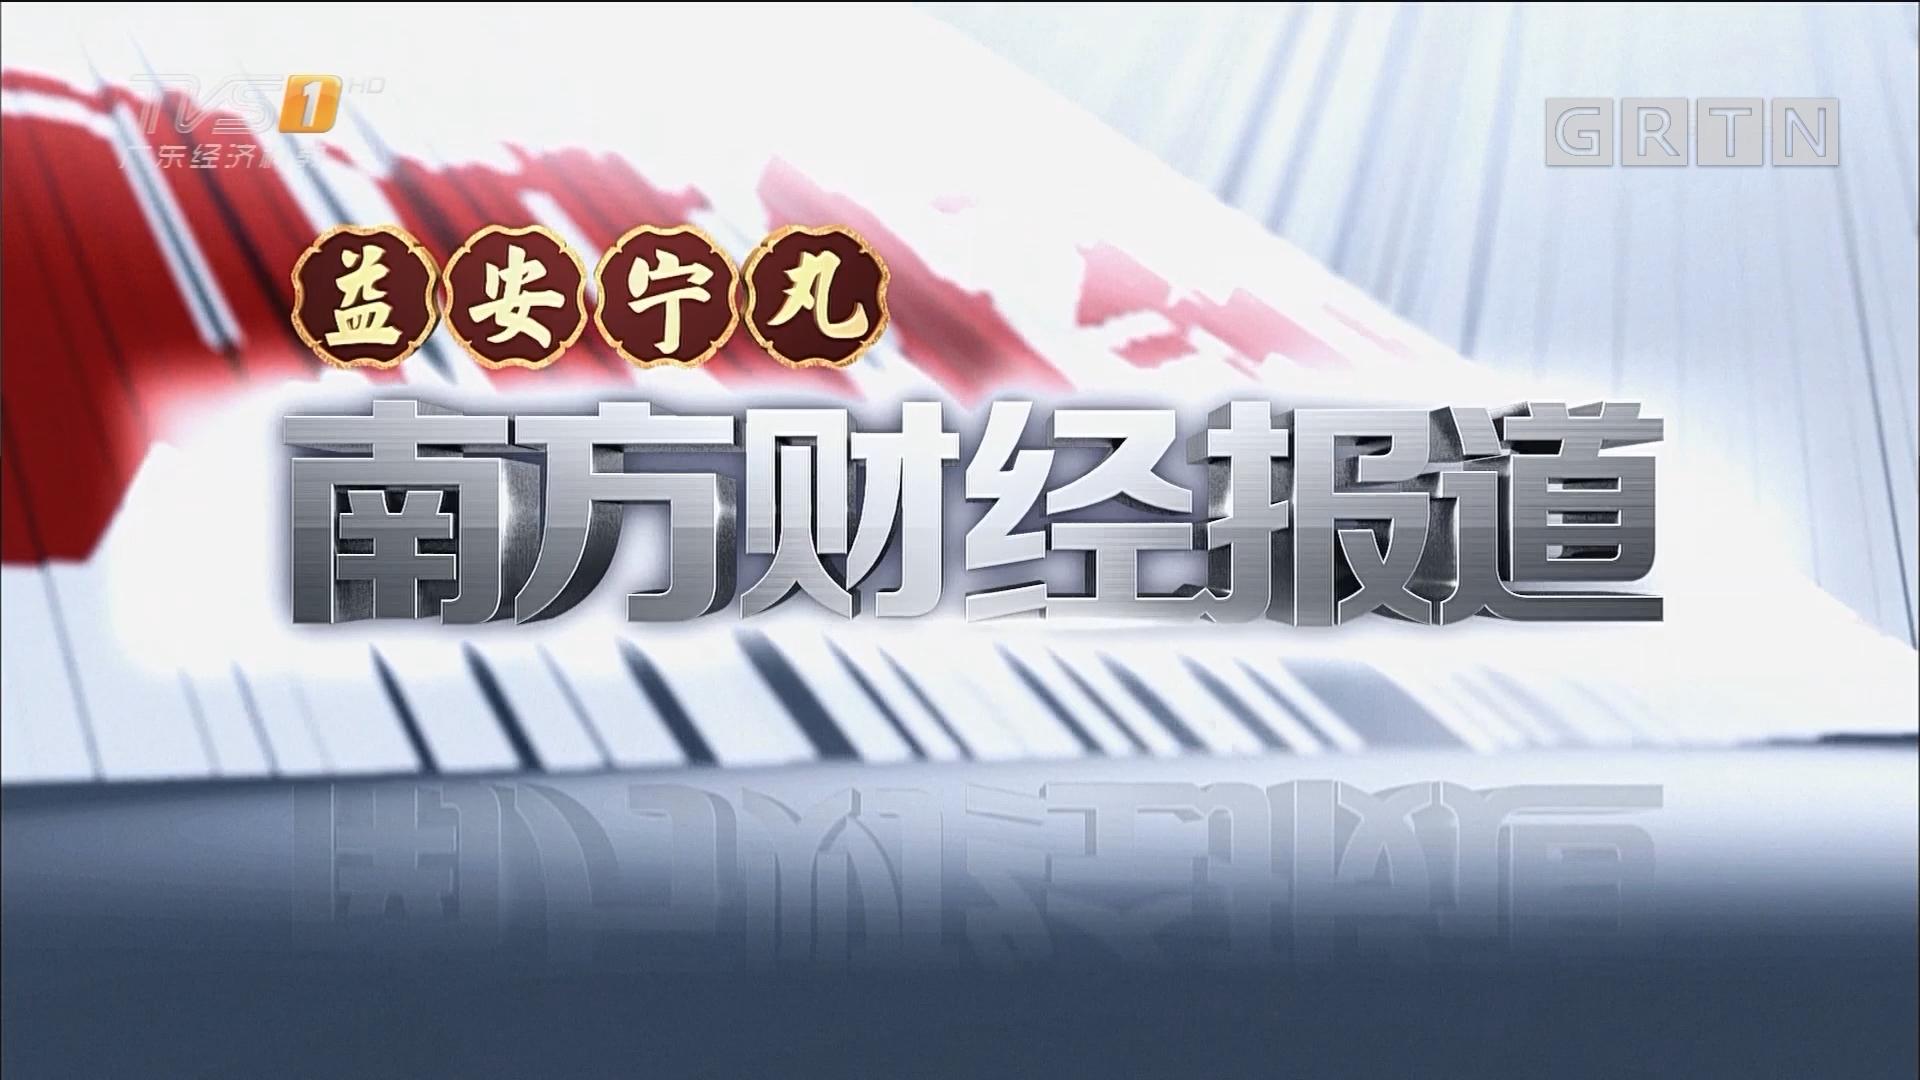 [HD][2017-07-06]南方财经报道:无力偿还校园贷 大学生疑似自杀轻生